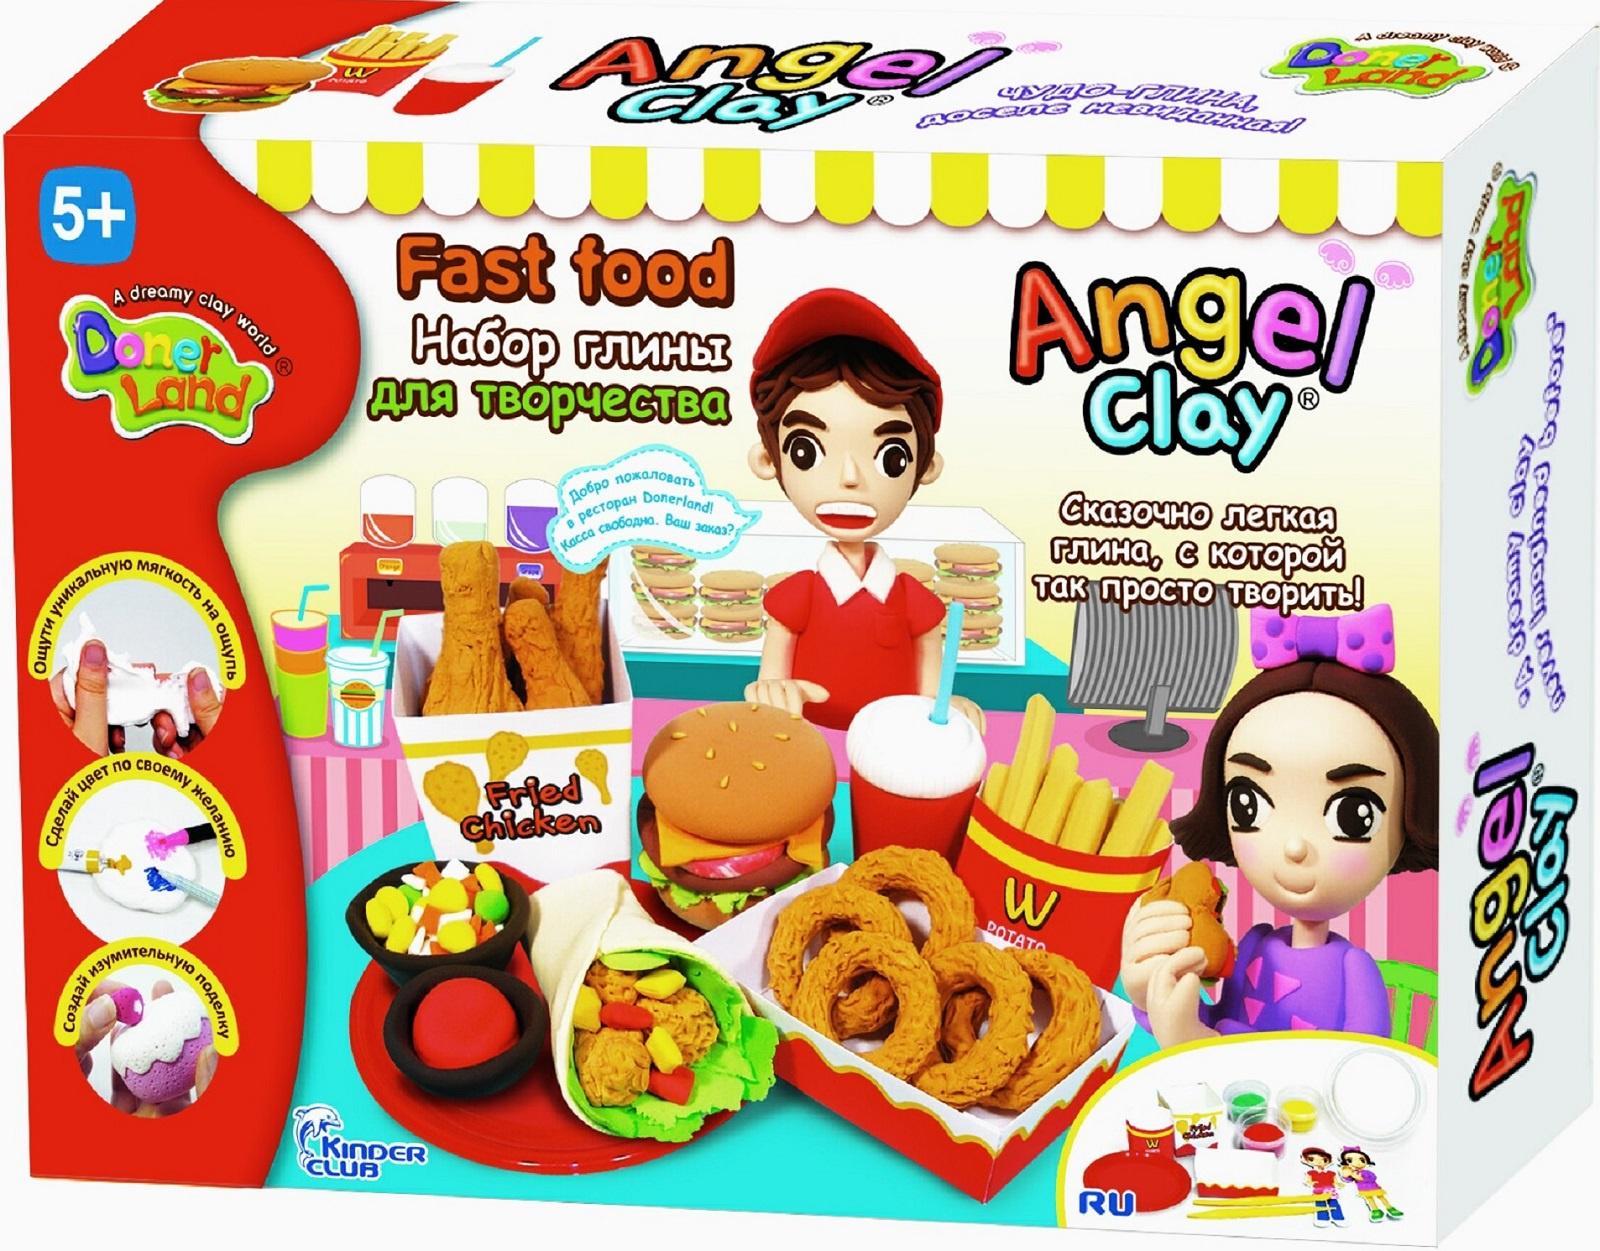 наборы для лепки angel clay набор для лепки angel clay шоколадная мастерская на русском языке Масса для лепки Angel Clay Фастфуд (Fastfood)